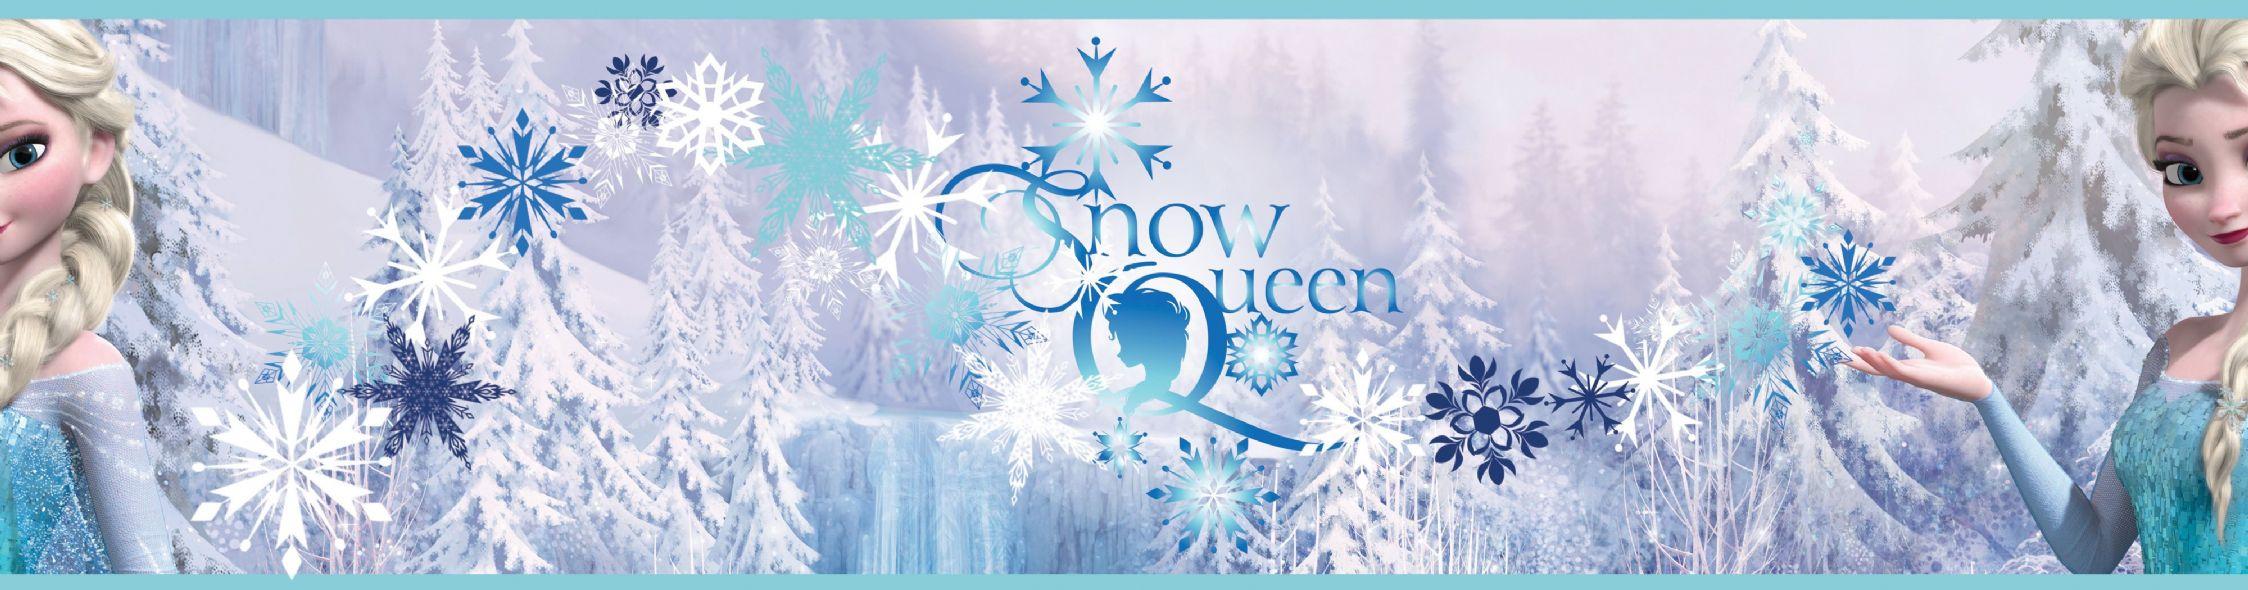 Disney Frozen Snow Queen Self Adhesive Wallpaper Border 5m 2248x590